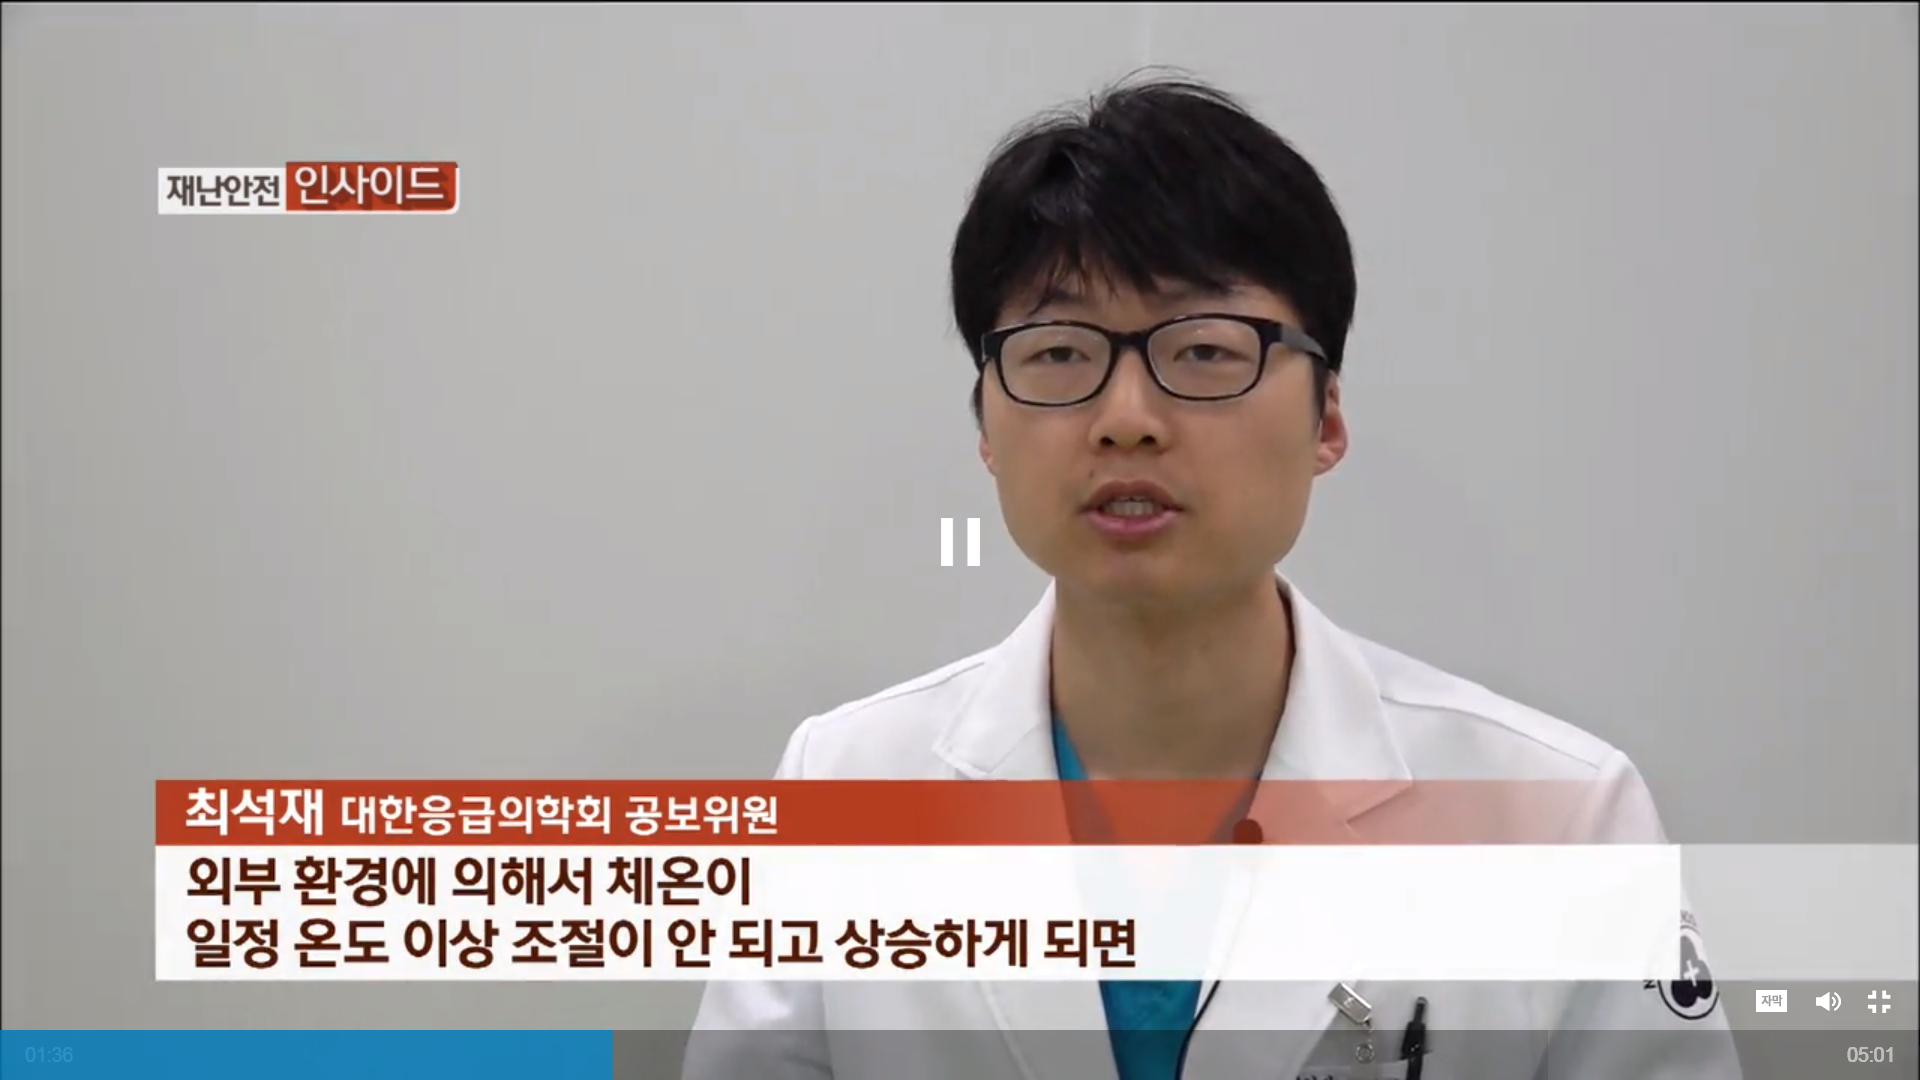 KBS 재난방송센터 인터뷰 - 2018년 6월 17일 방송